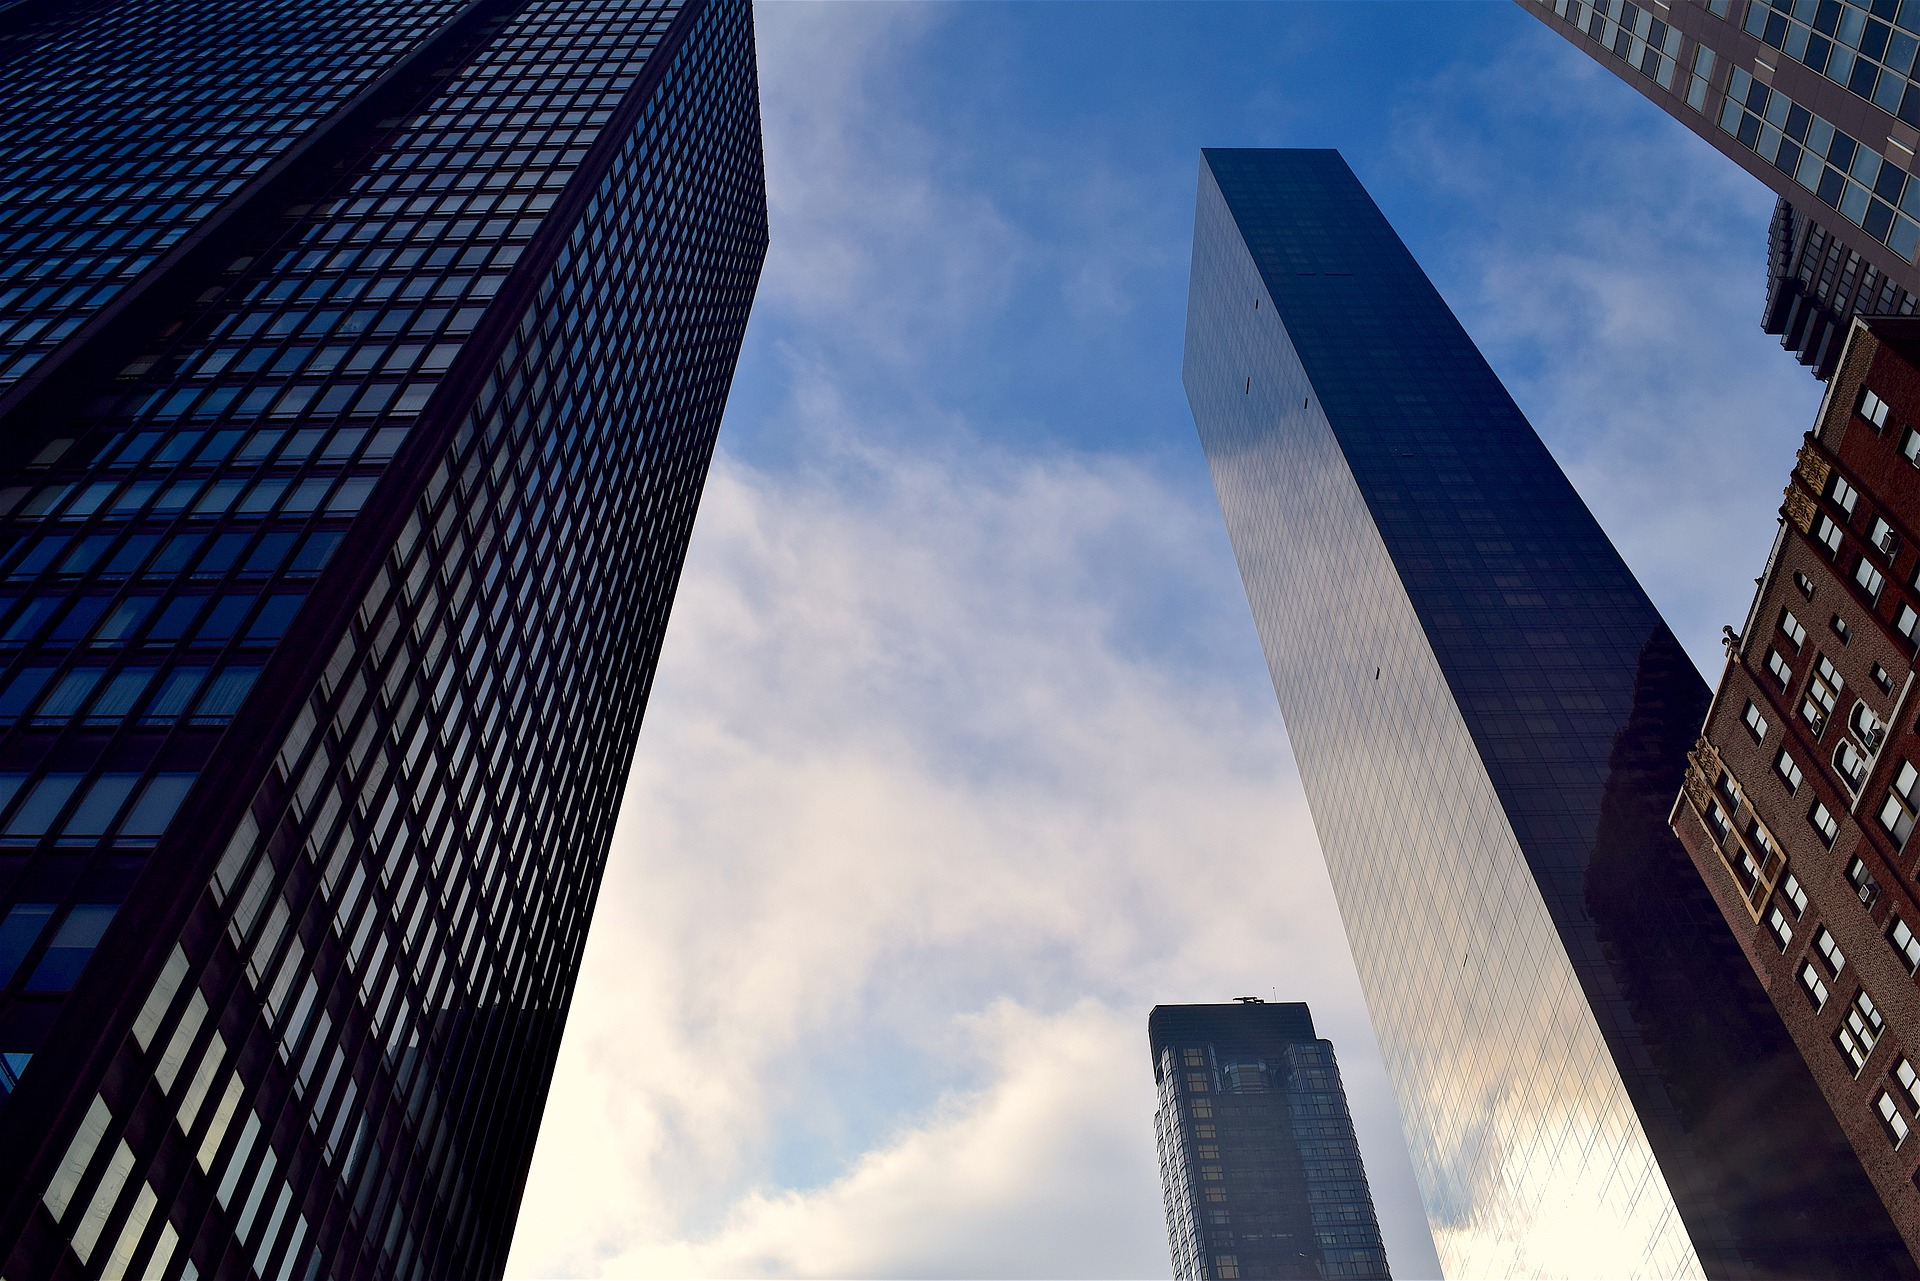 new-york-city-2001501_1920.jpg